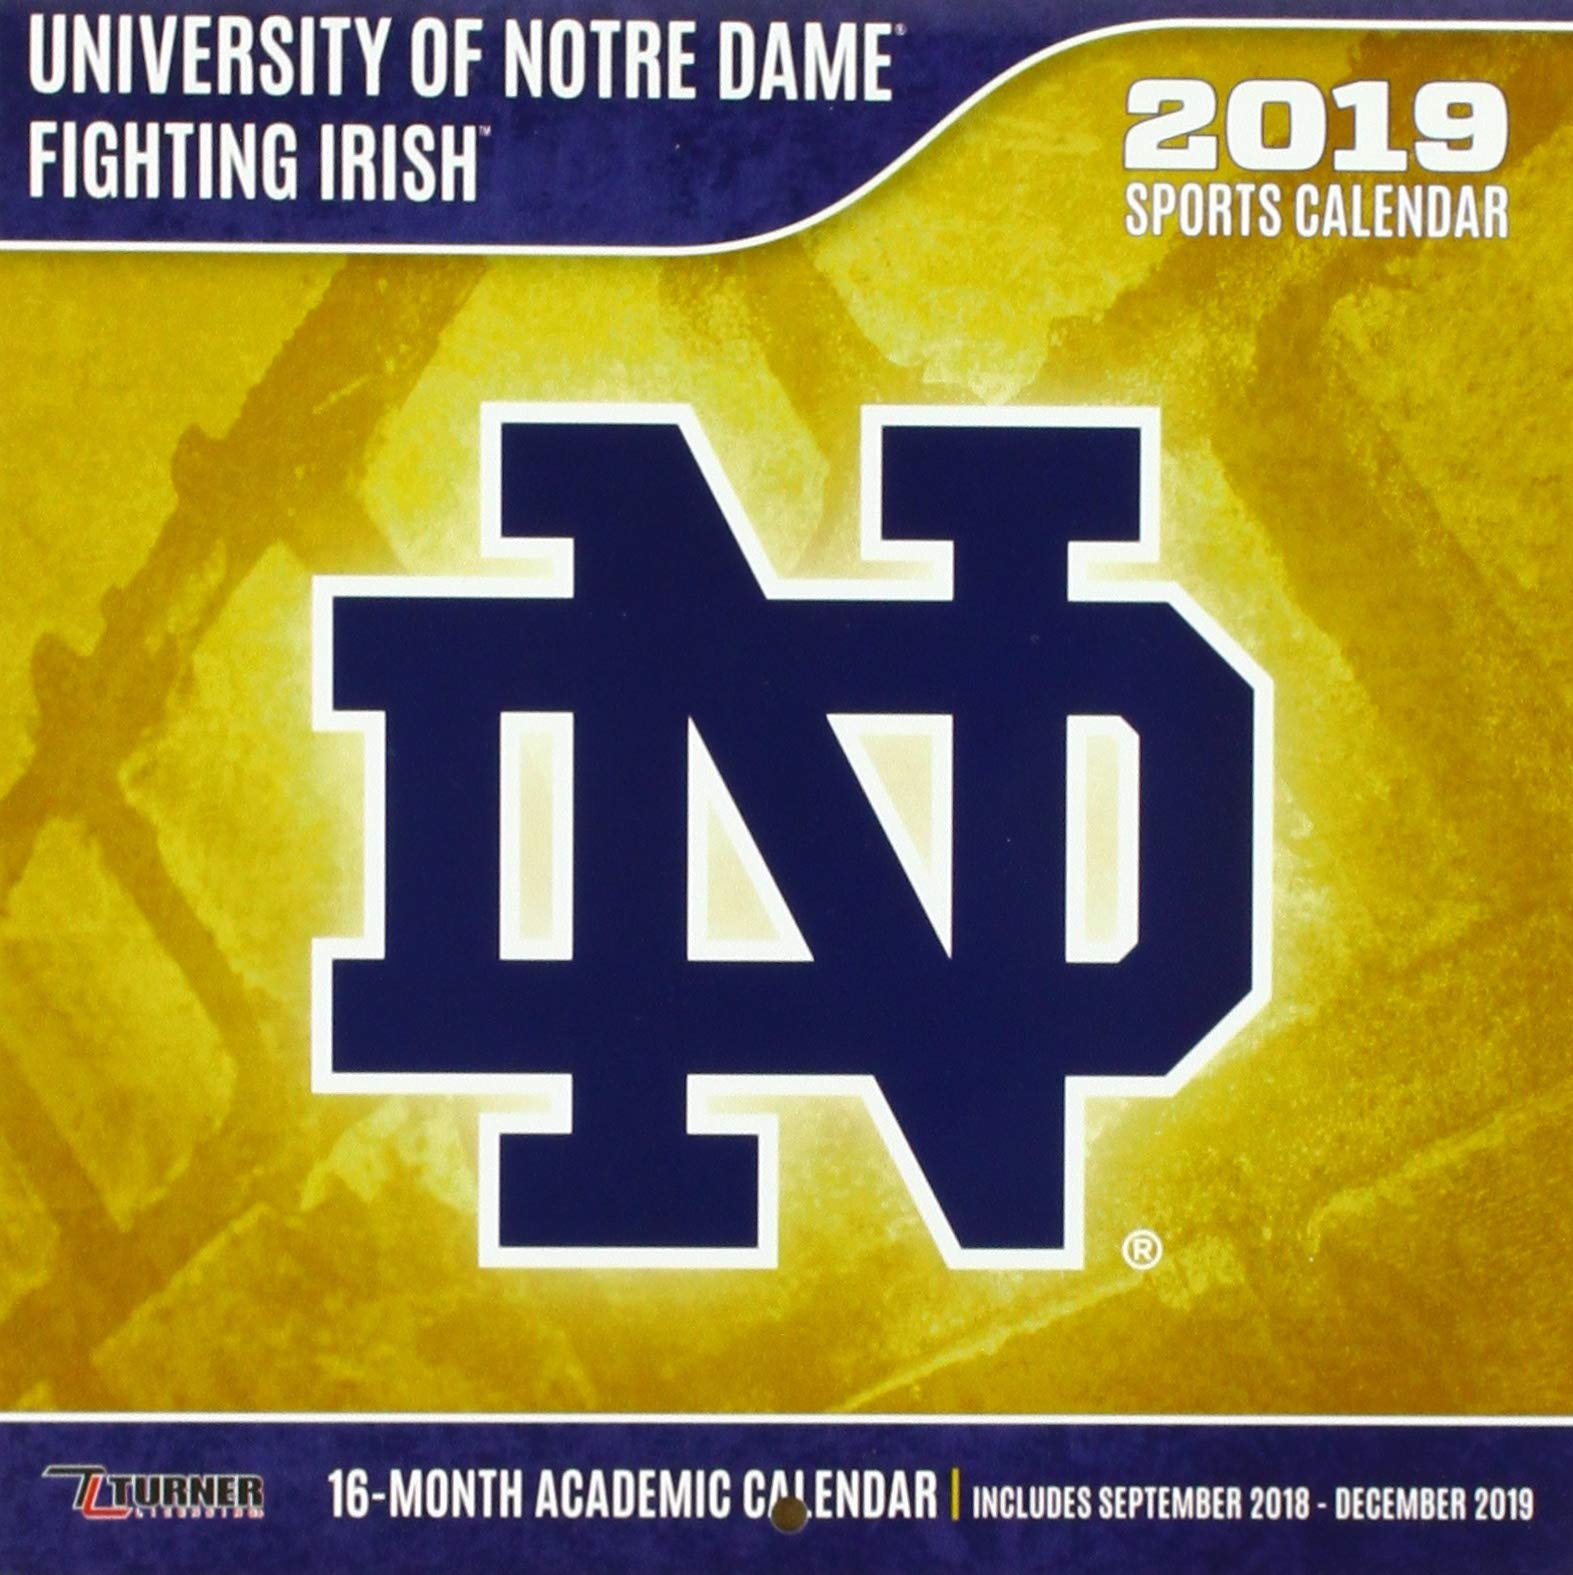 University of Notre Dame Fighting Irish 2019 Sports Calendar